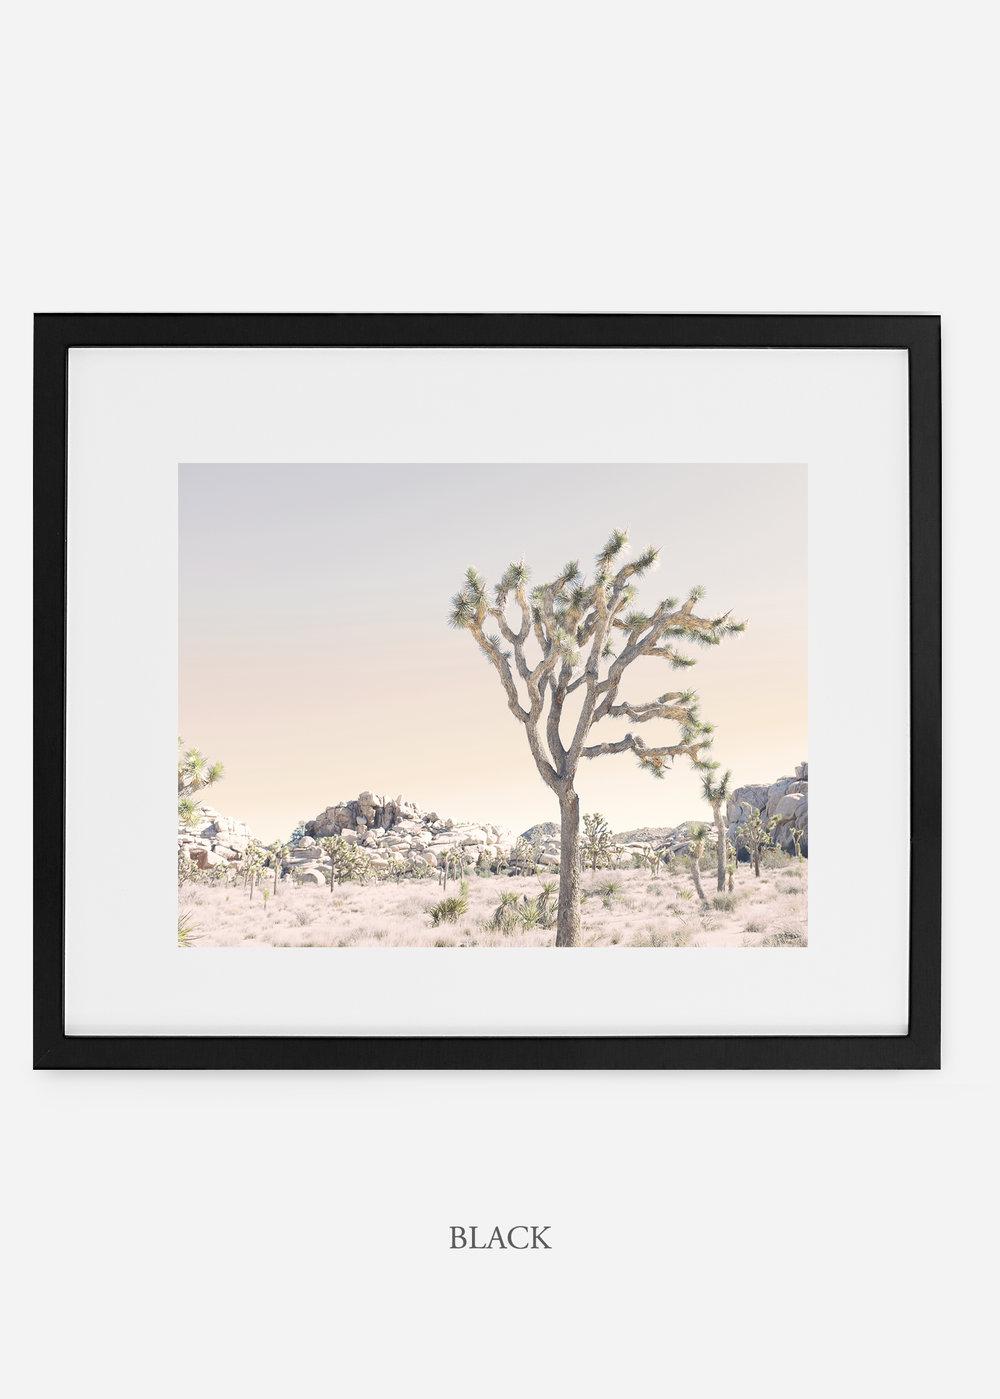 WilderCalifornia_blackframe_JoshuaTree_No.3_interiordesign_prints_art.jpg